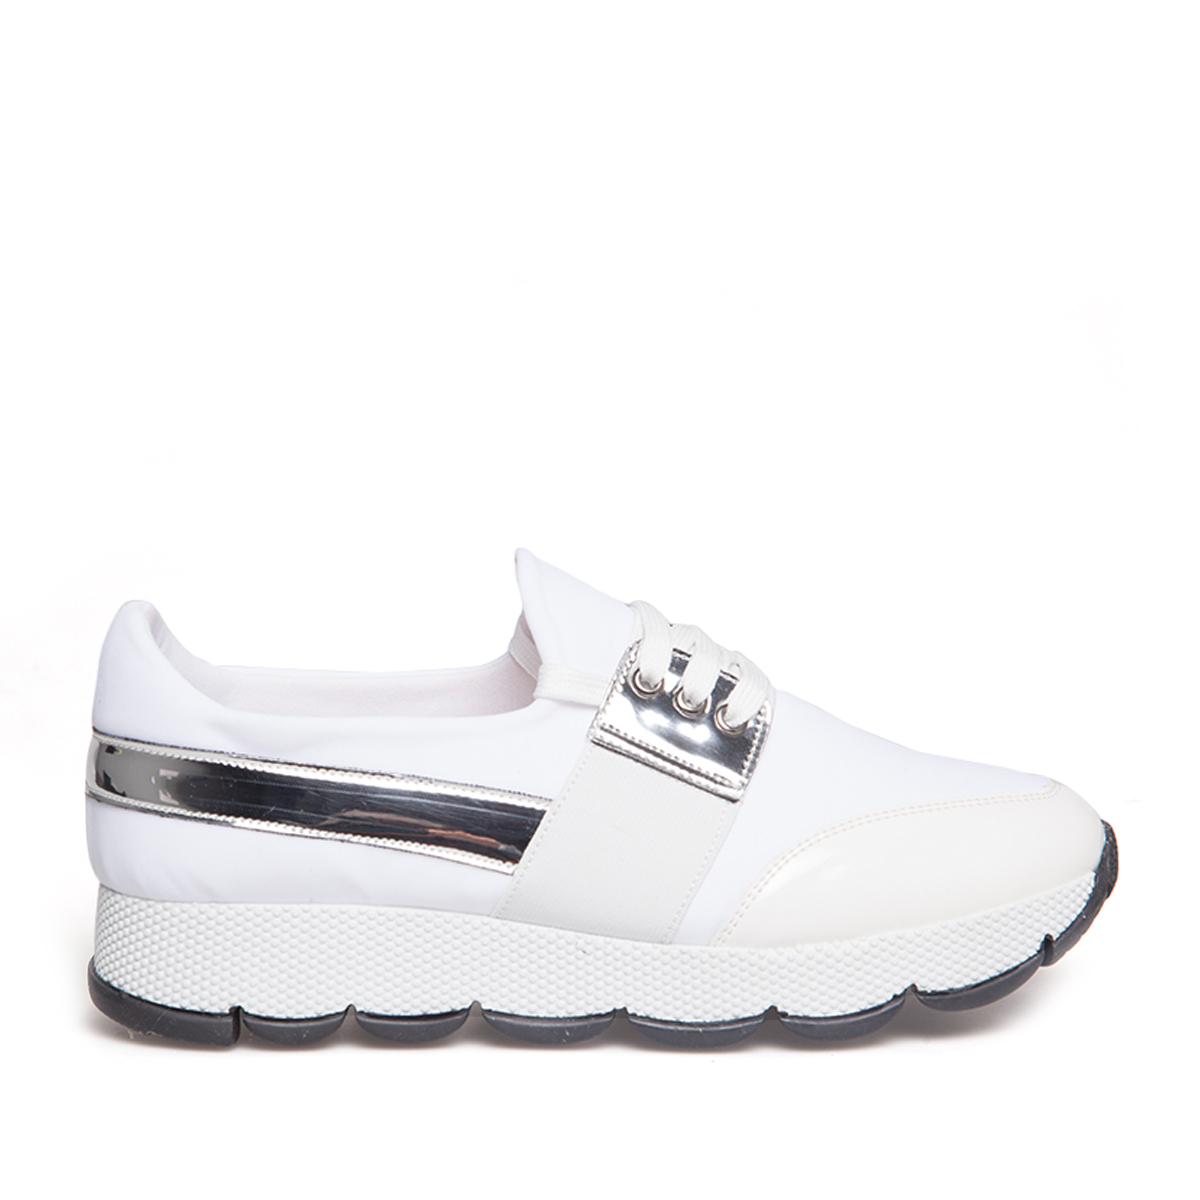 Pierre Cardin Shoes WOMEN SHOES 90020